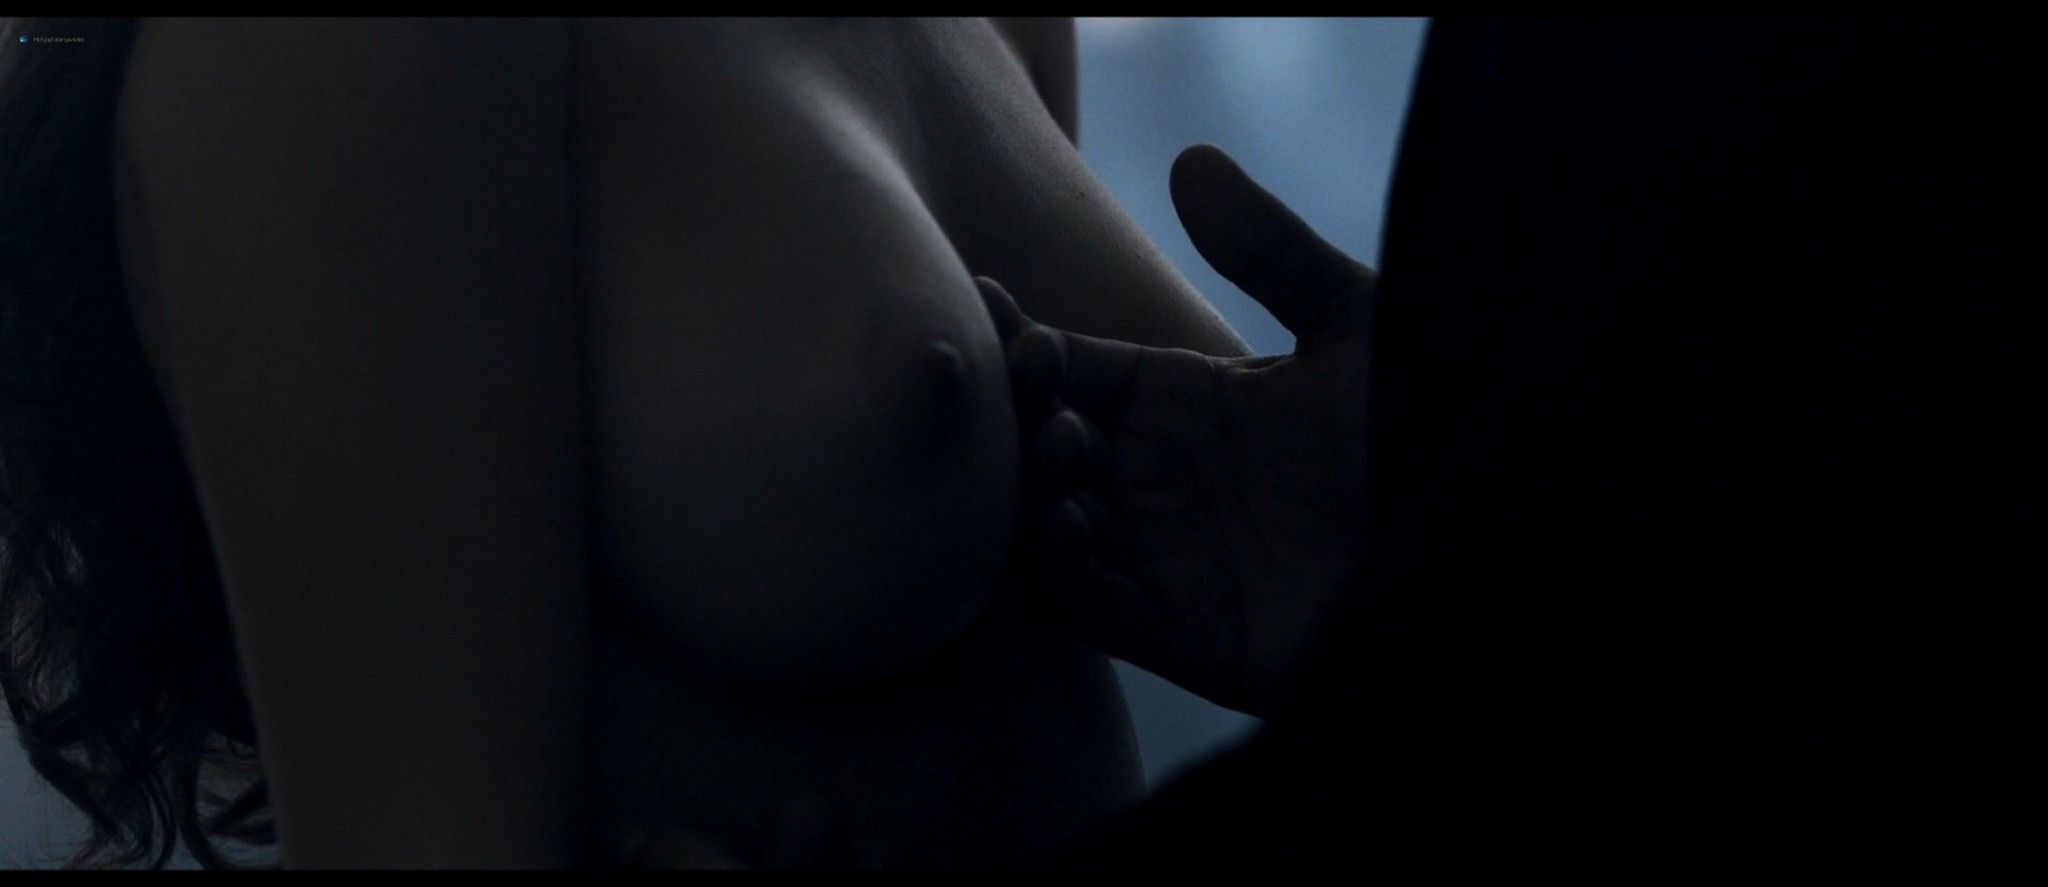 Alicia Sanz nude hot sex - En Brazos de un sesino (2019) HD 1080p Web (10)